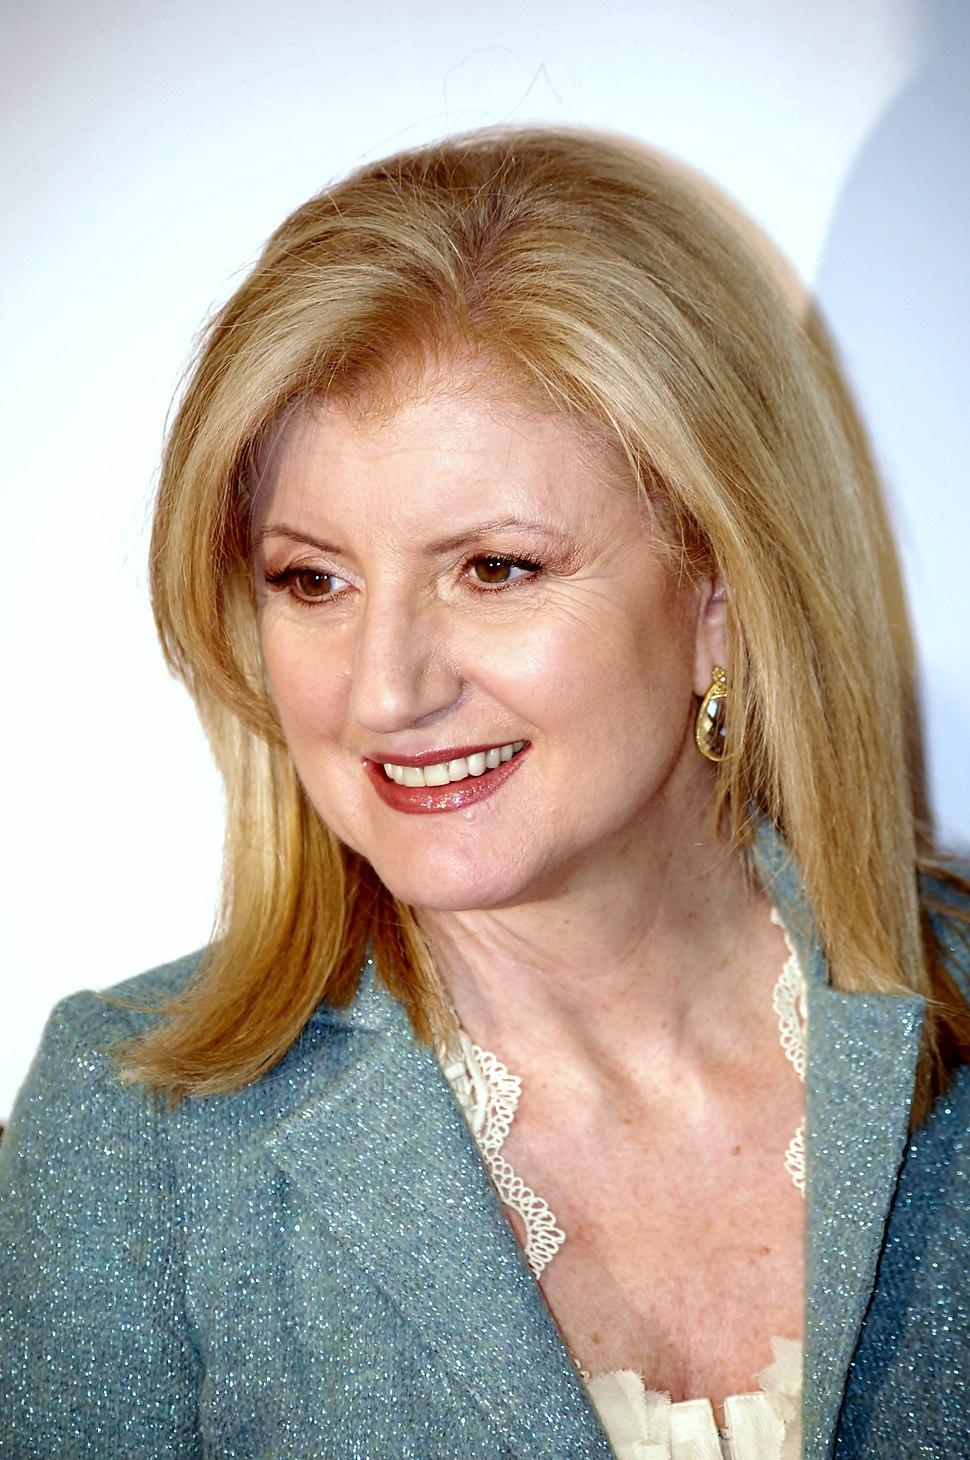 Arianna Huffington 2011 Shankbone 2